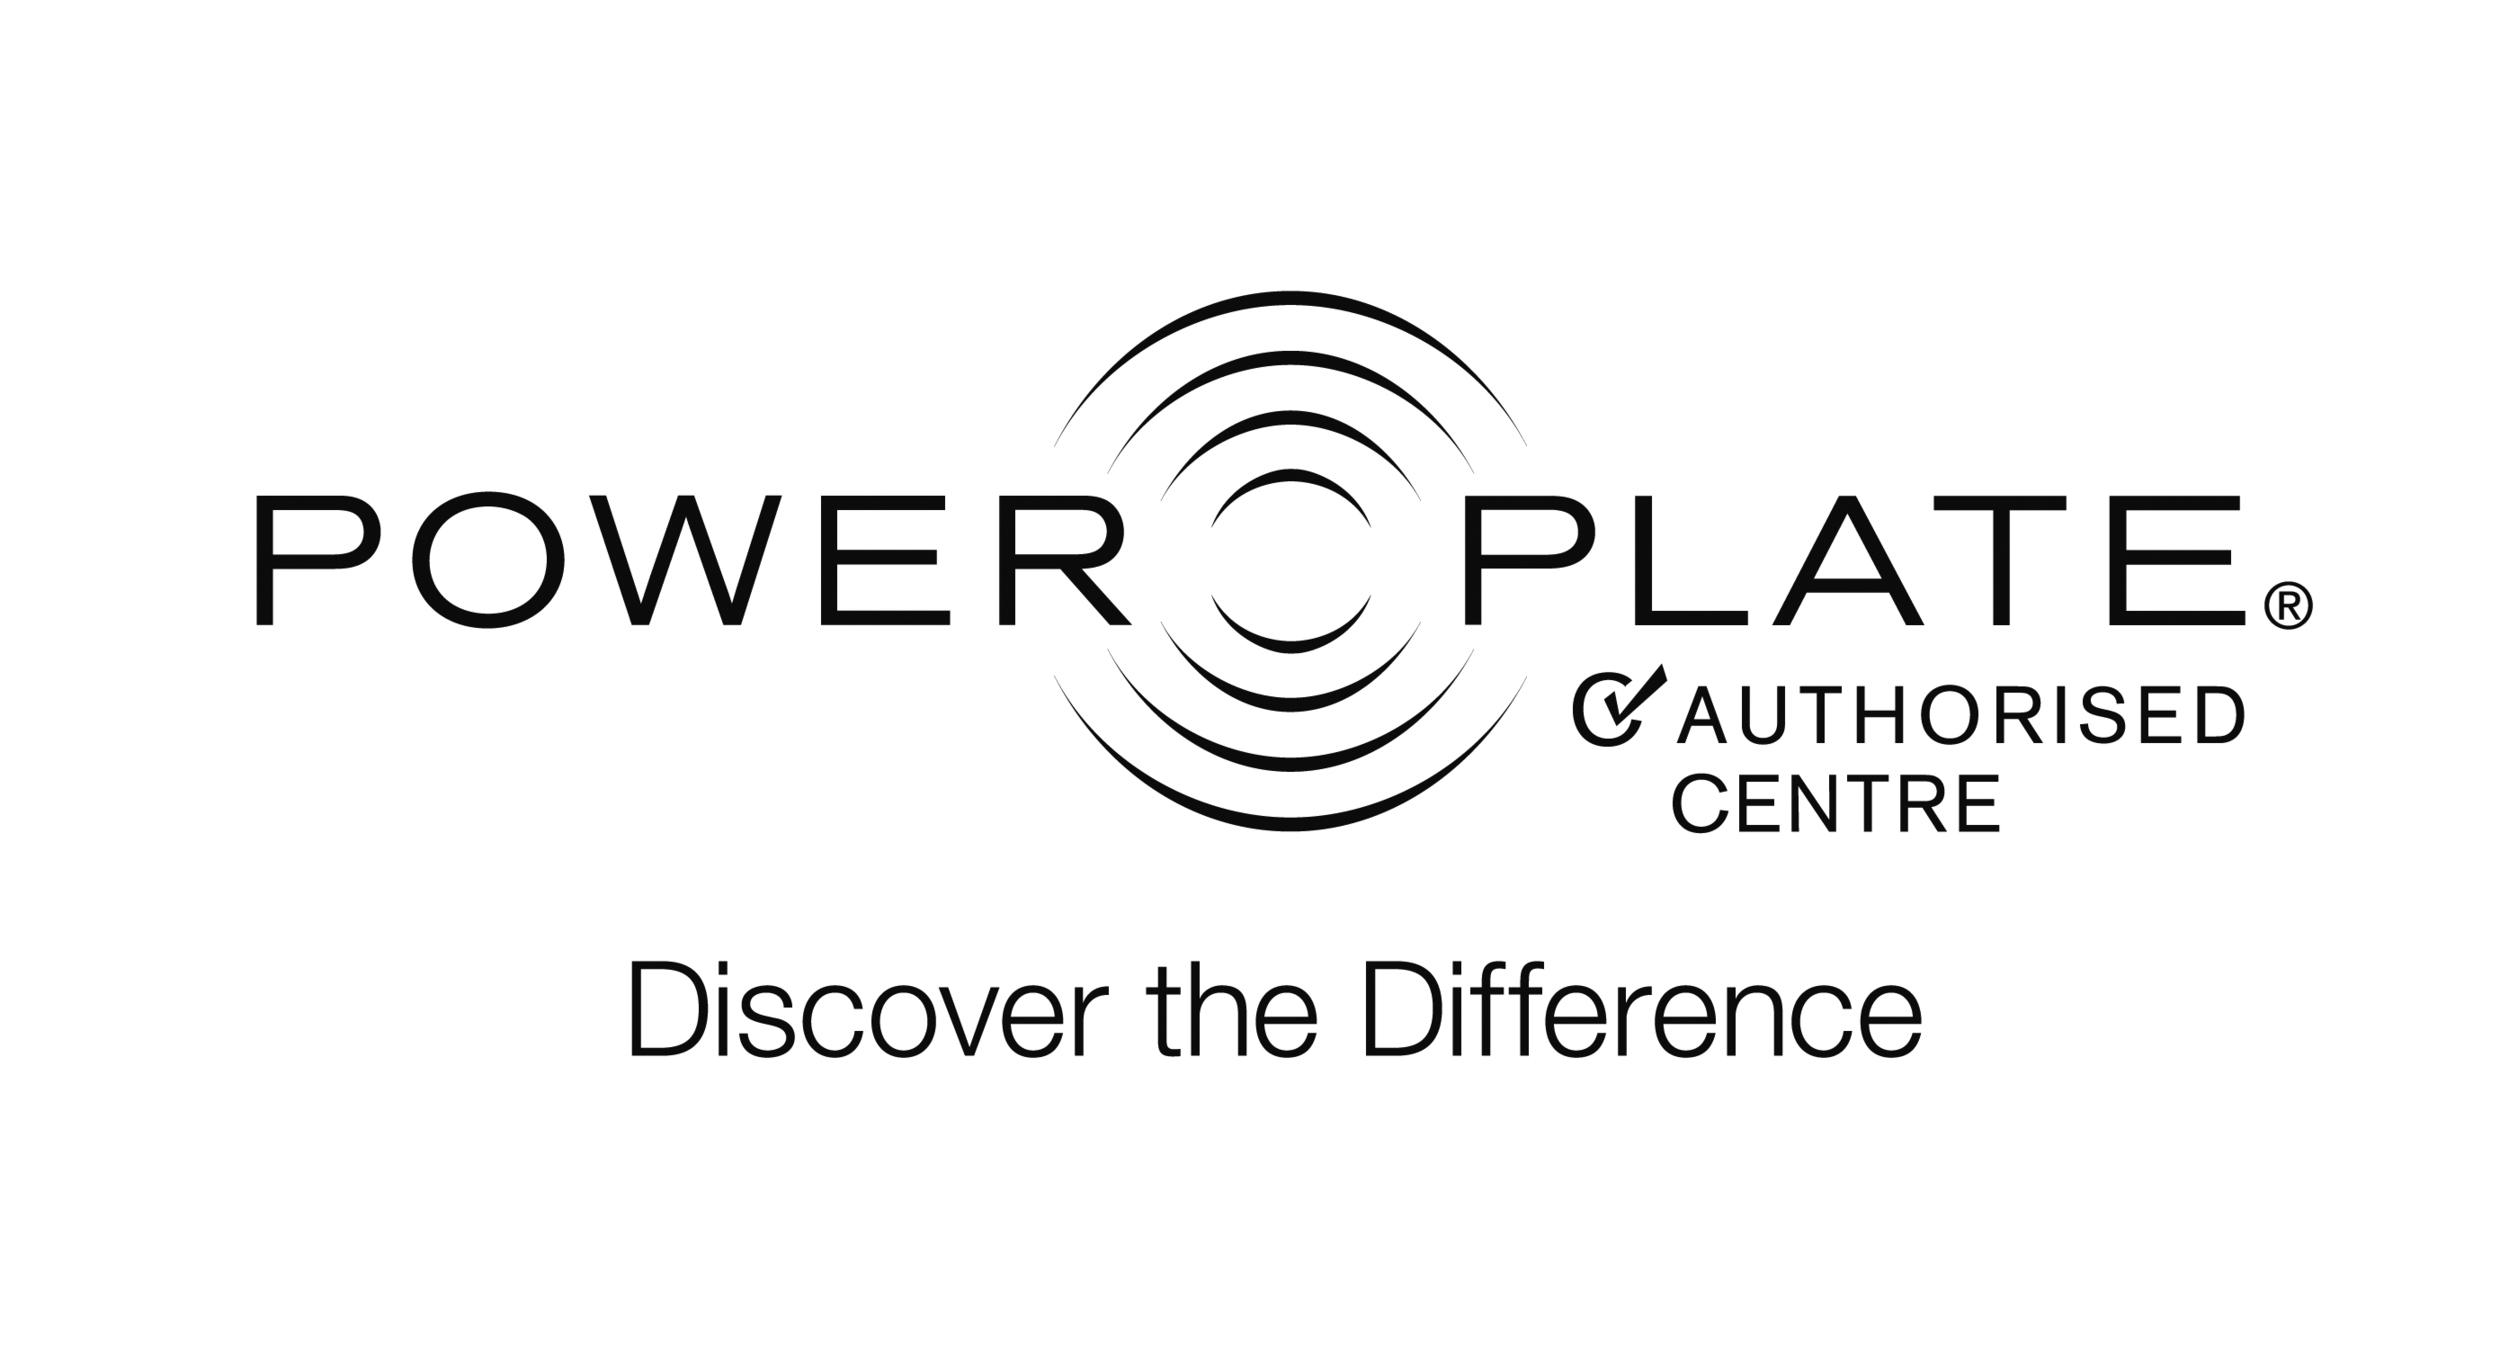 PowerPlate-authorised-Logo-K.jpg